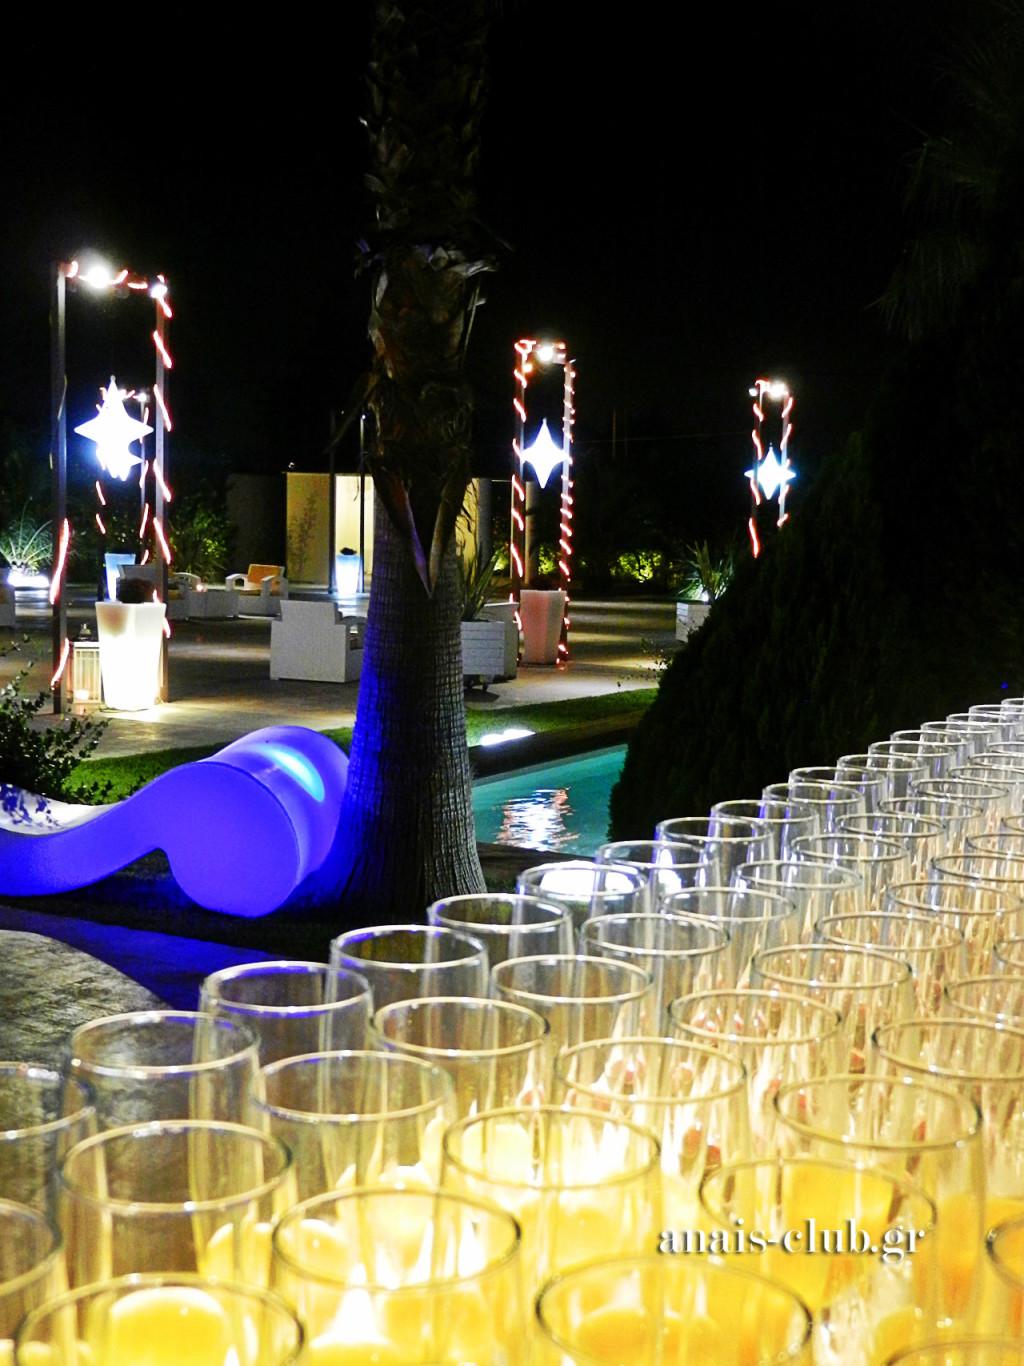 Bellini cocktail μια ακόμα επιλογή για το καλωσόρισμα των καλεσμένων